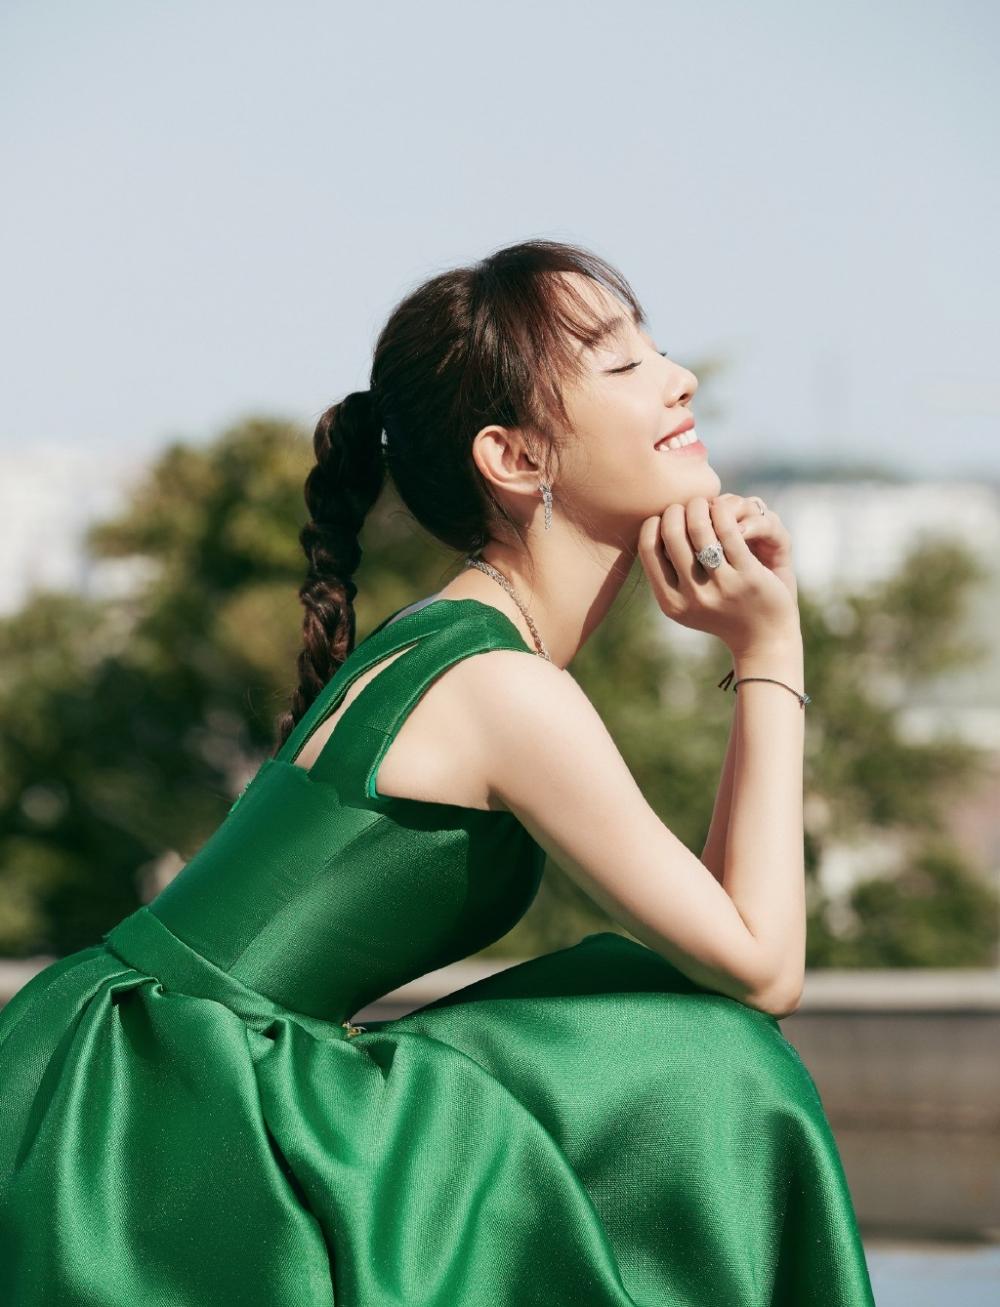 2019nba打架视频大全|爱游戏官网